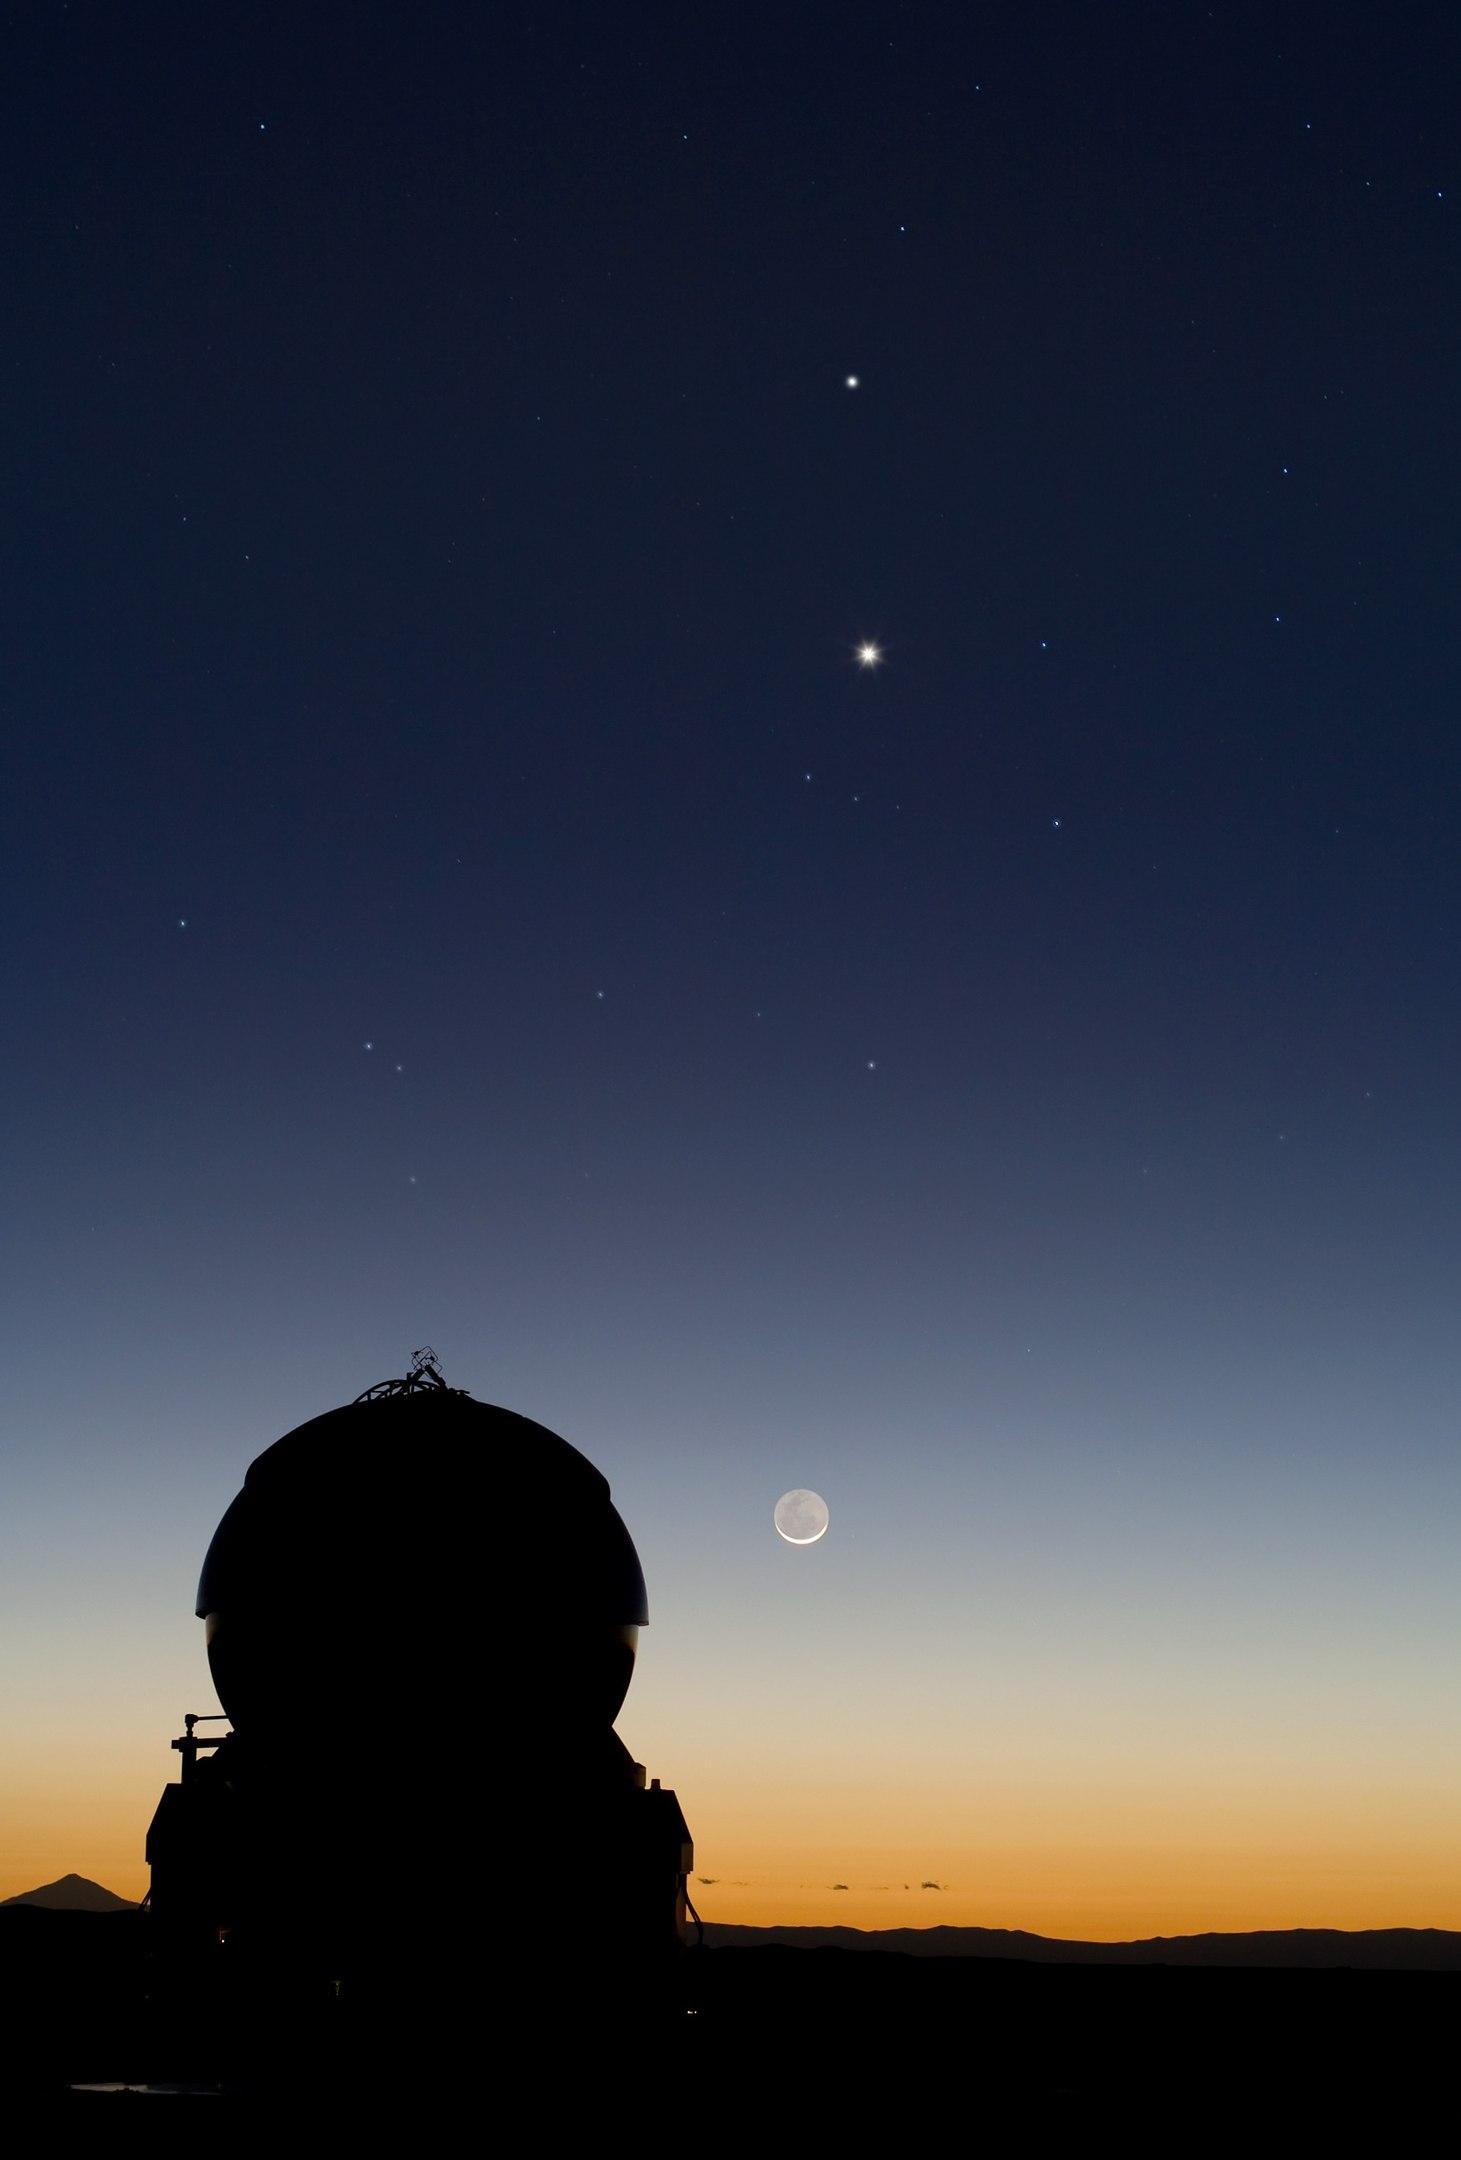 Меркурий на звёздном небе